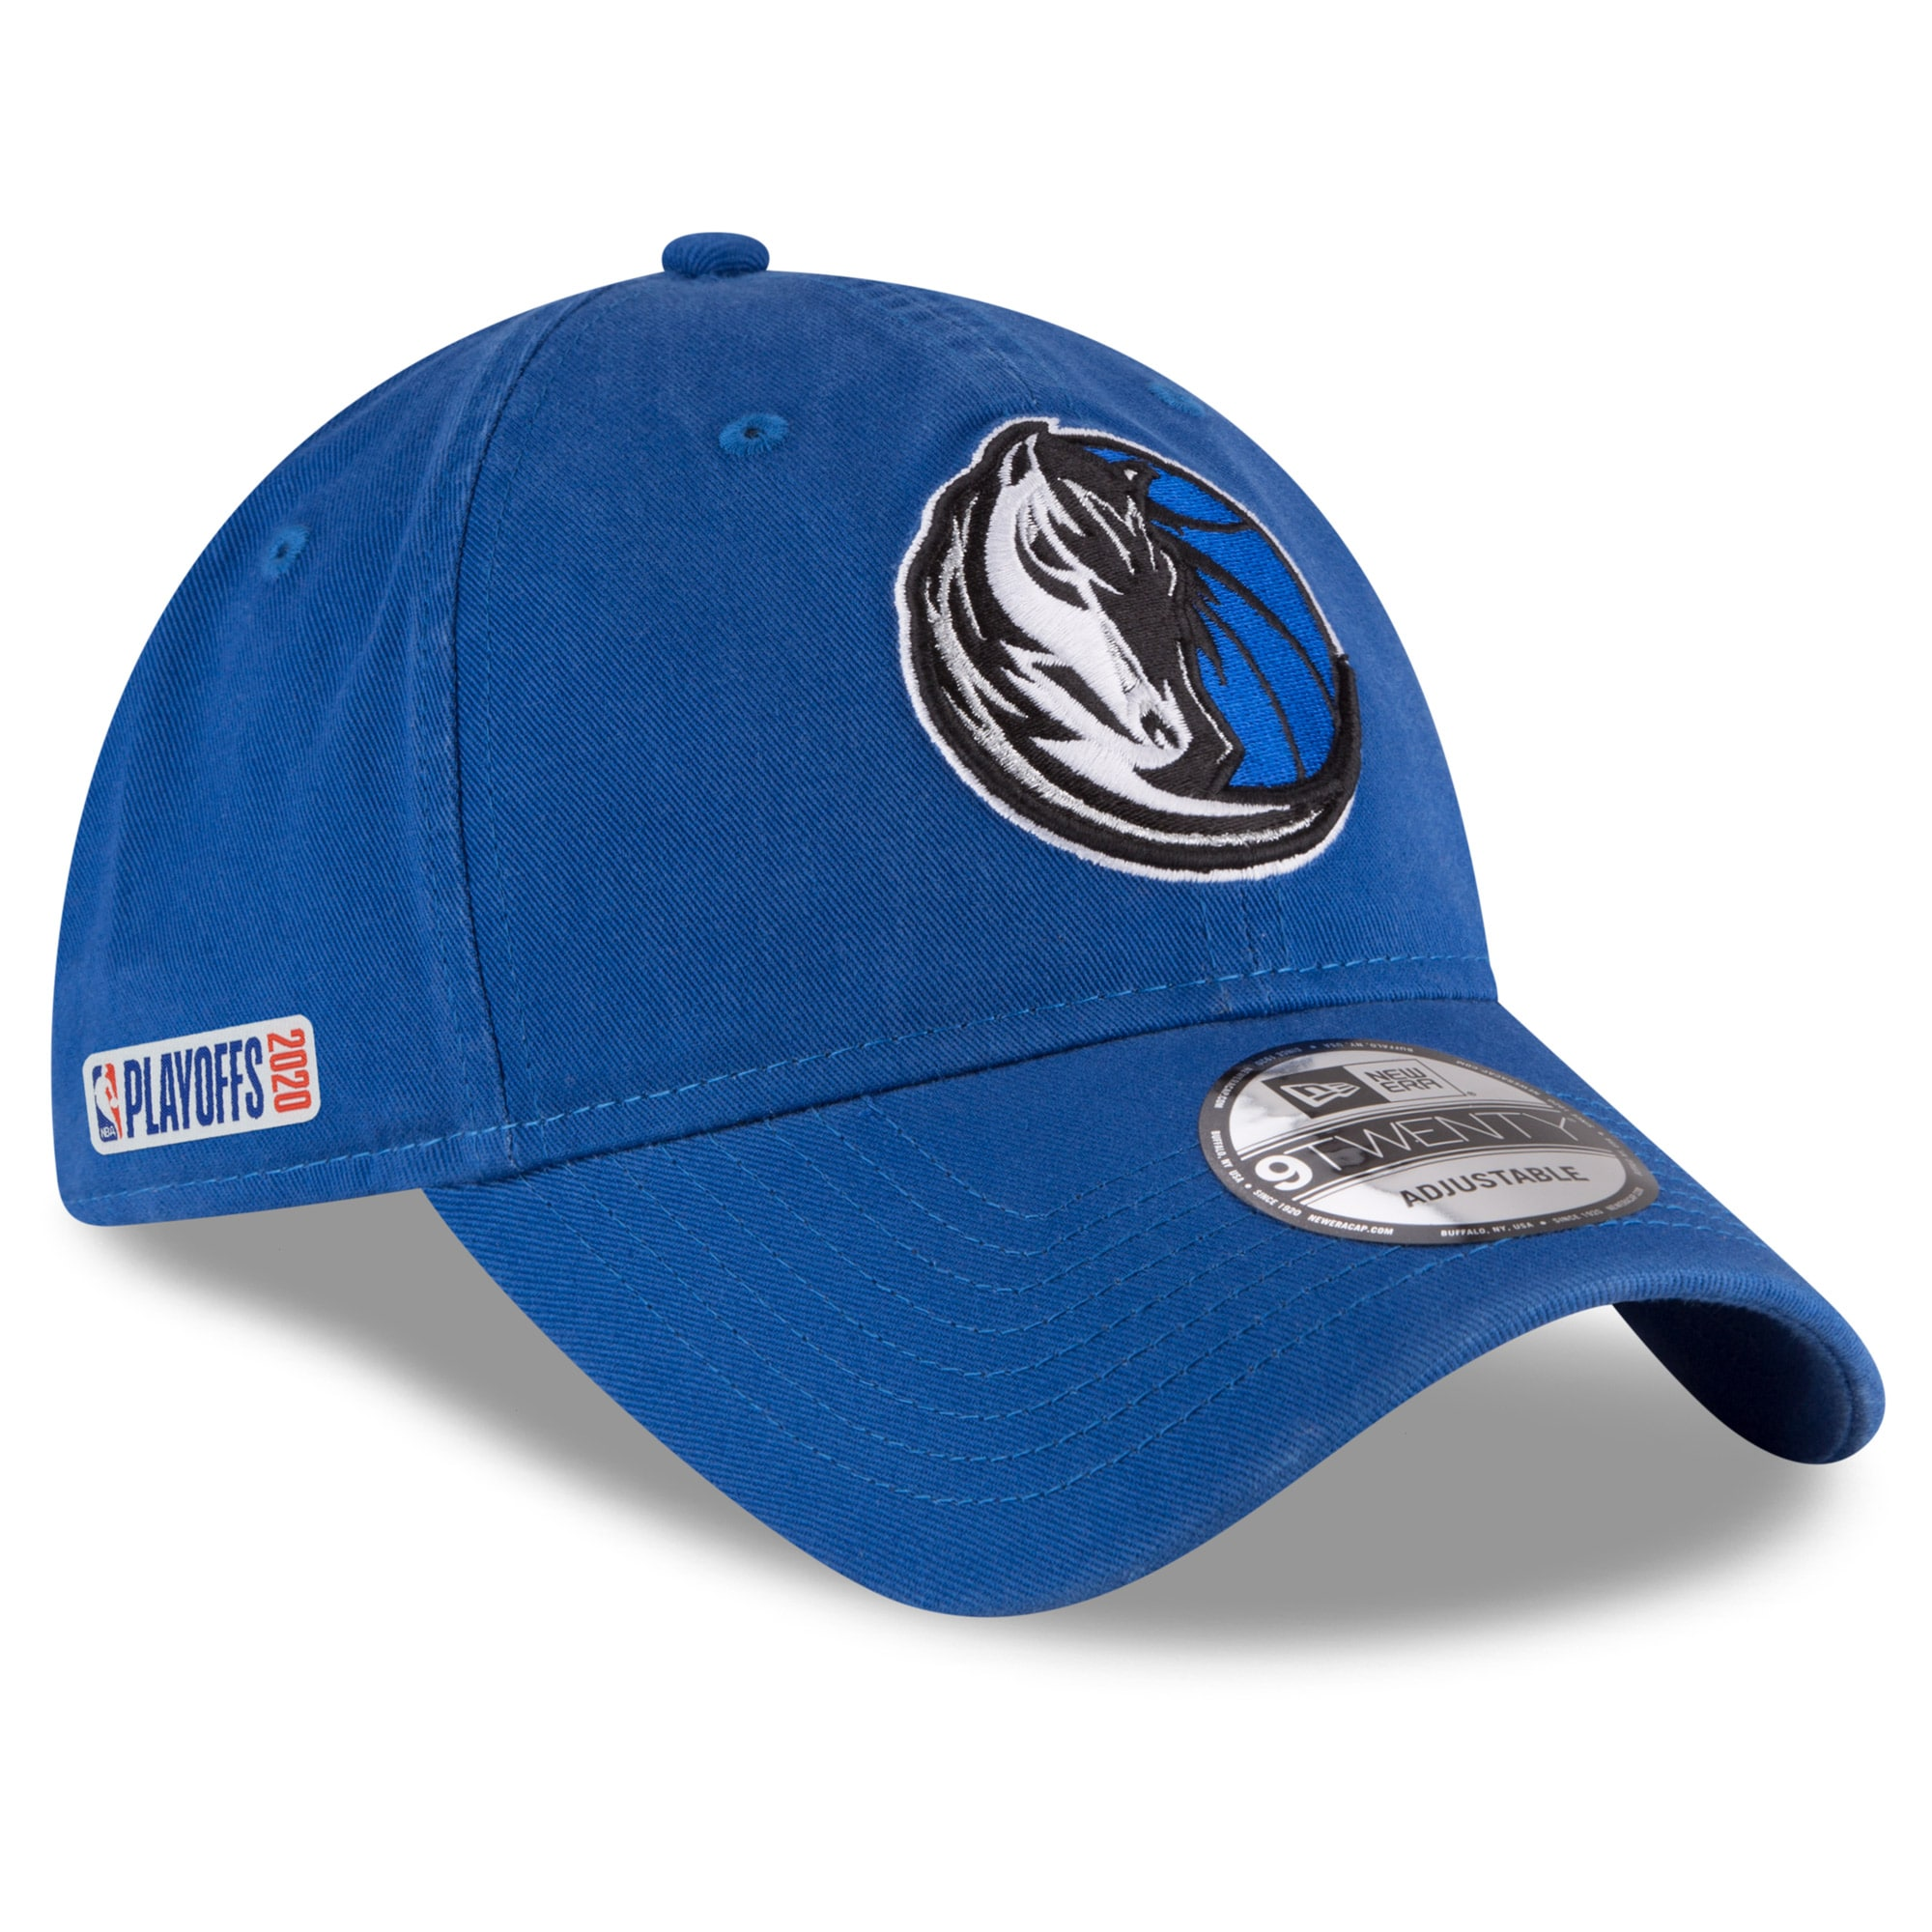 Dallas Mavericks New Era 2020 NBA Playoffs Bound 9TWENTY Adjustable Hat - Blue